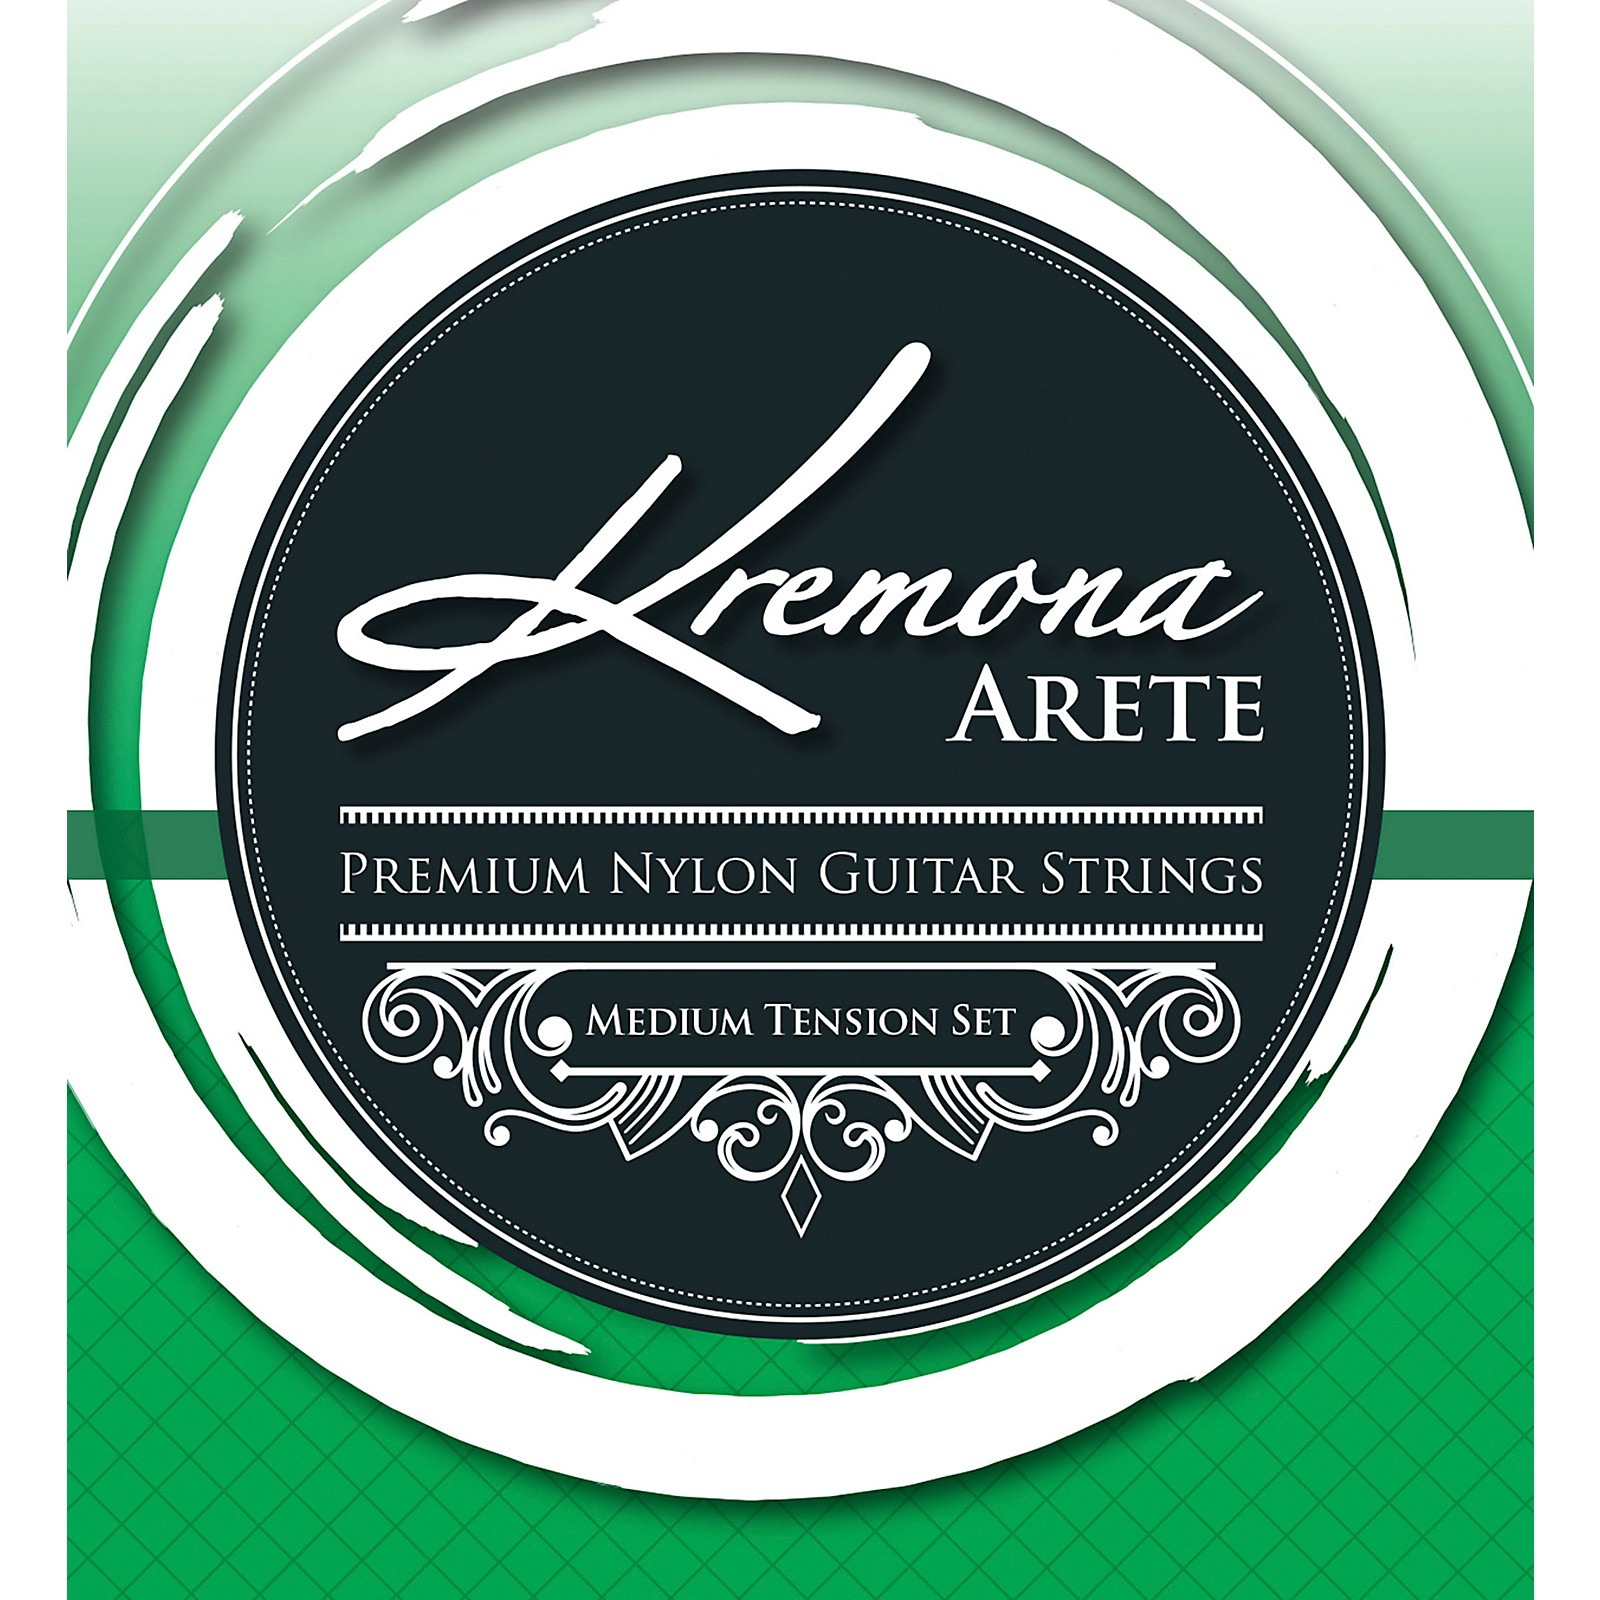 Kremona Arete Premium Nylon Guitar Strings Medium Tension Set